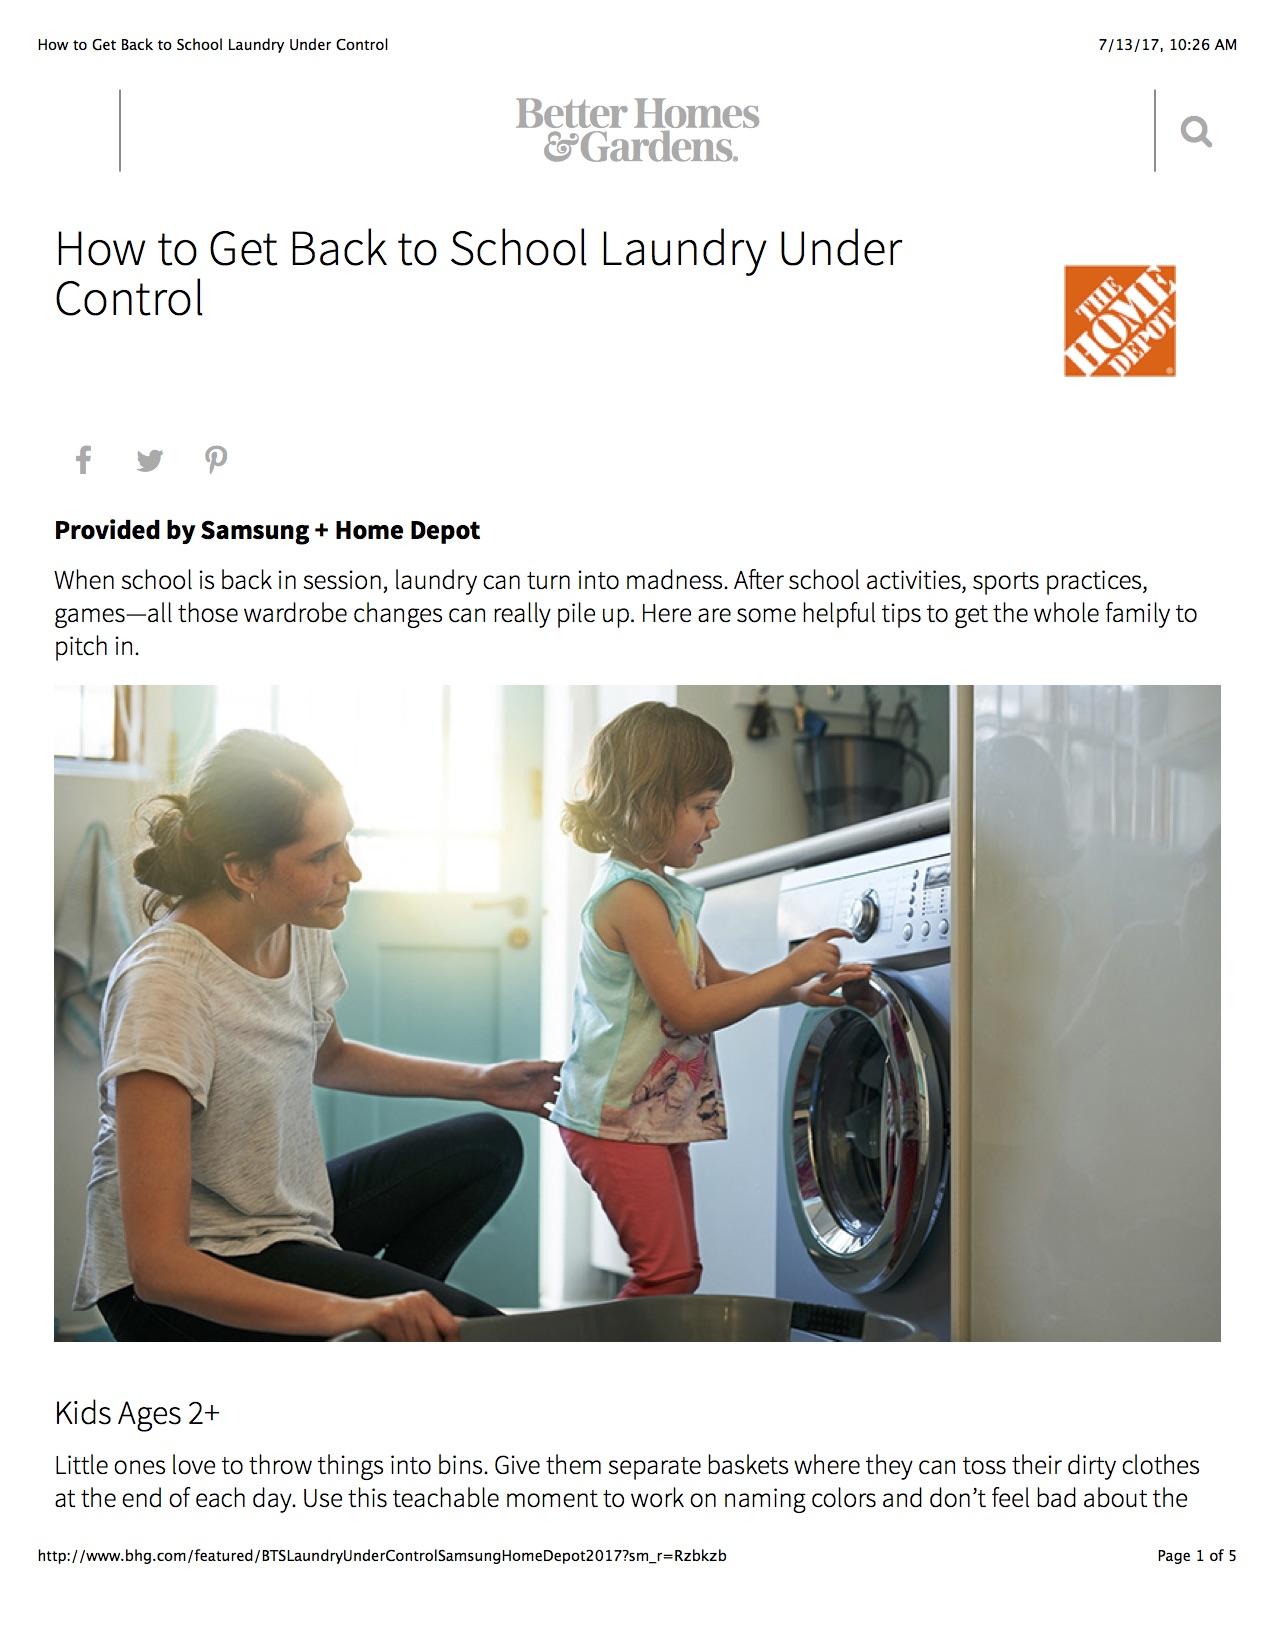 laundry control 1.jpg